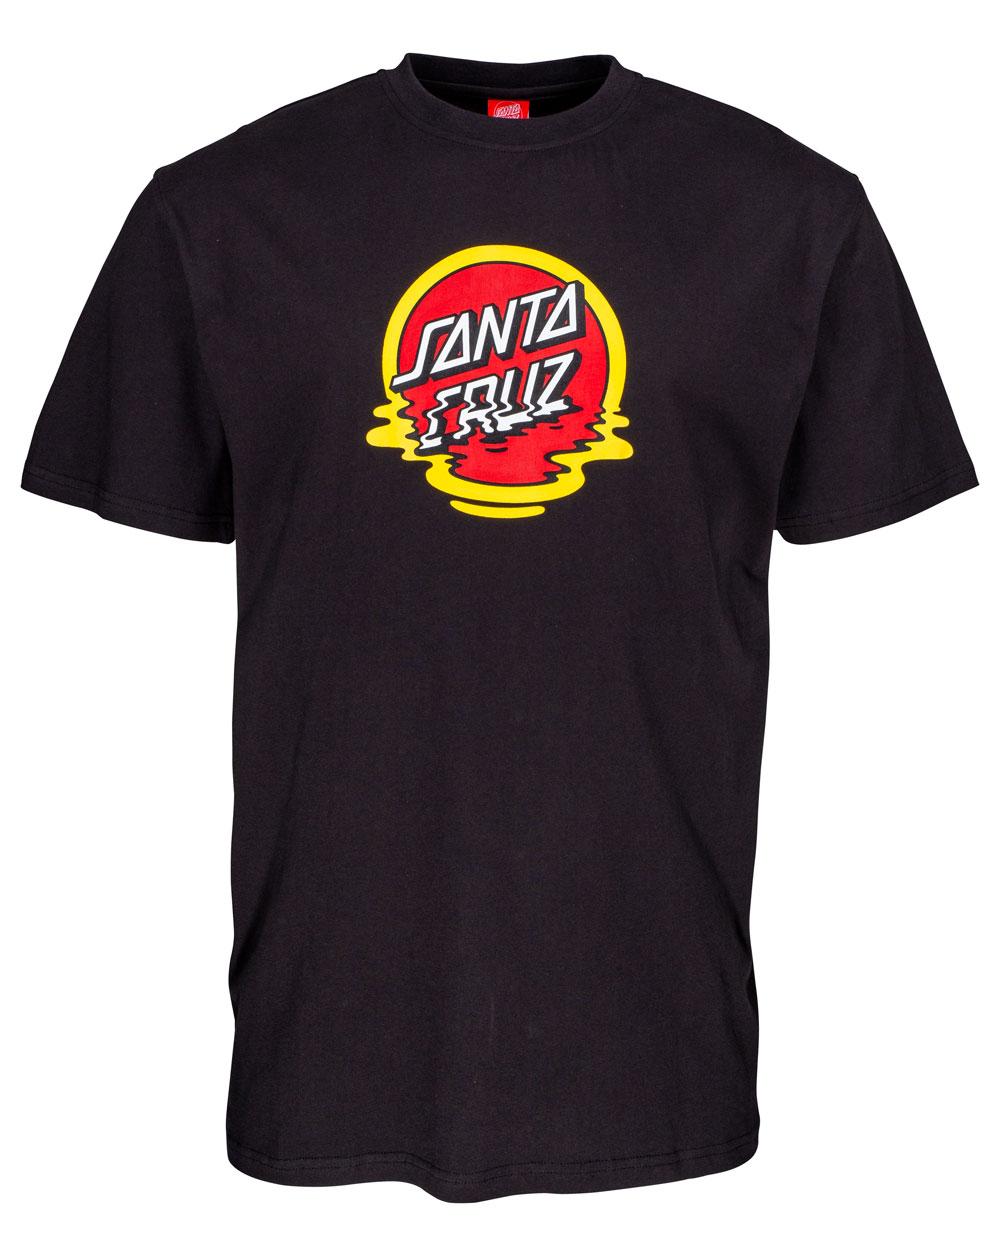 Santa Cruz Men's T-Shirt Dot Reflection Black